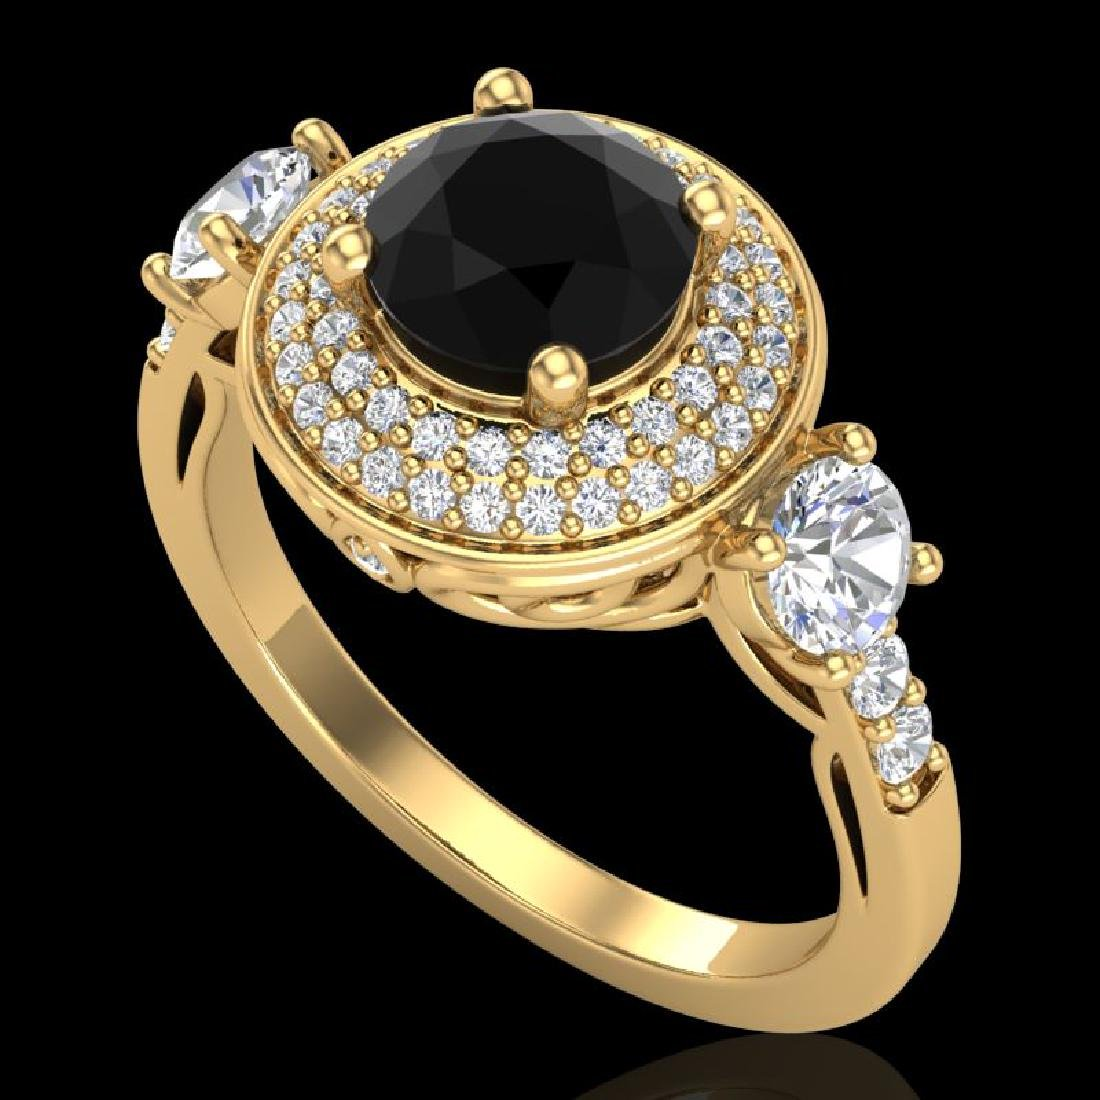 2.05 CTW Fancy Black Diamond Solitaire Art Deco 3 Stone